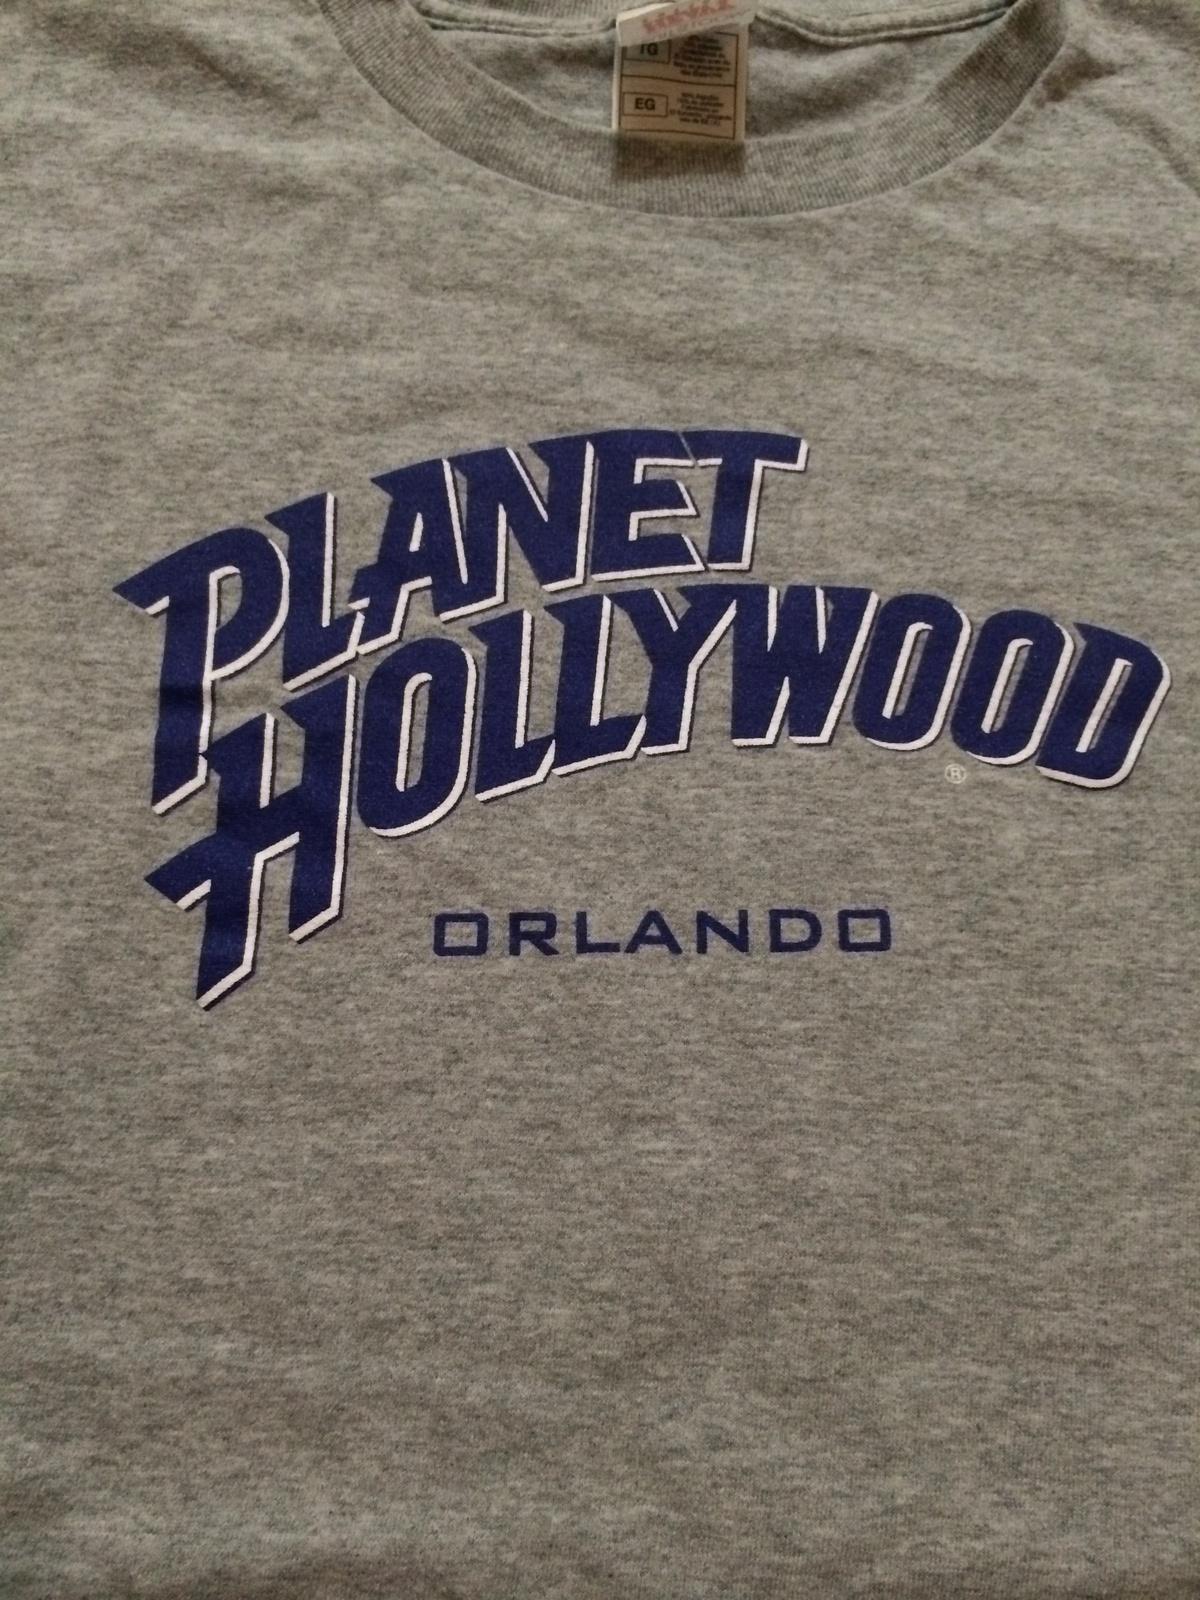 "Planet Hollywood "" Orlando "" Cool T-Shirt Sz XL  Florida  Great Piece!"